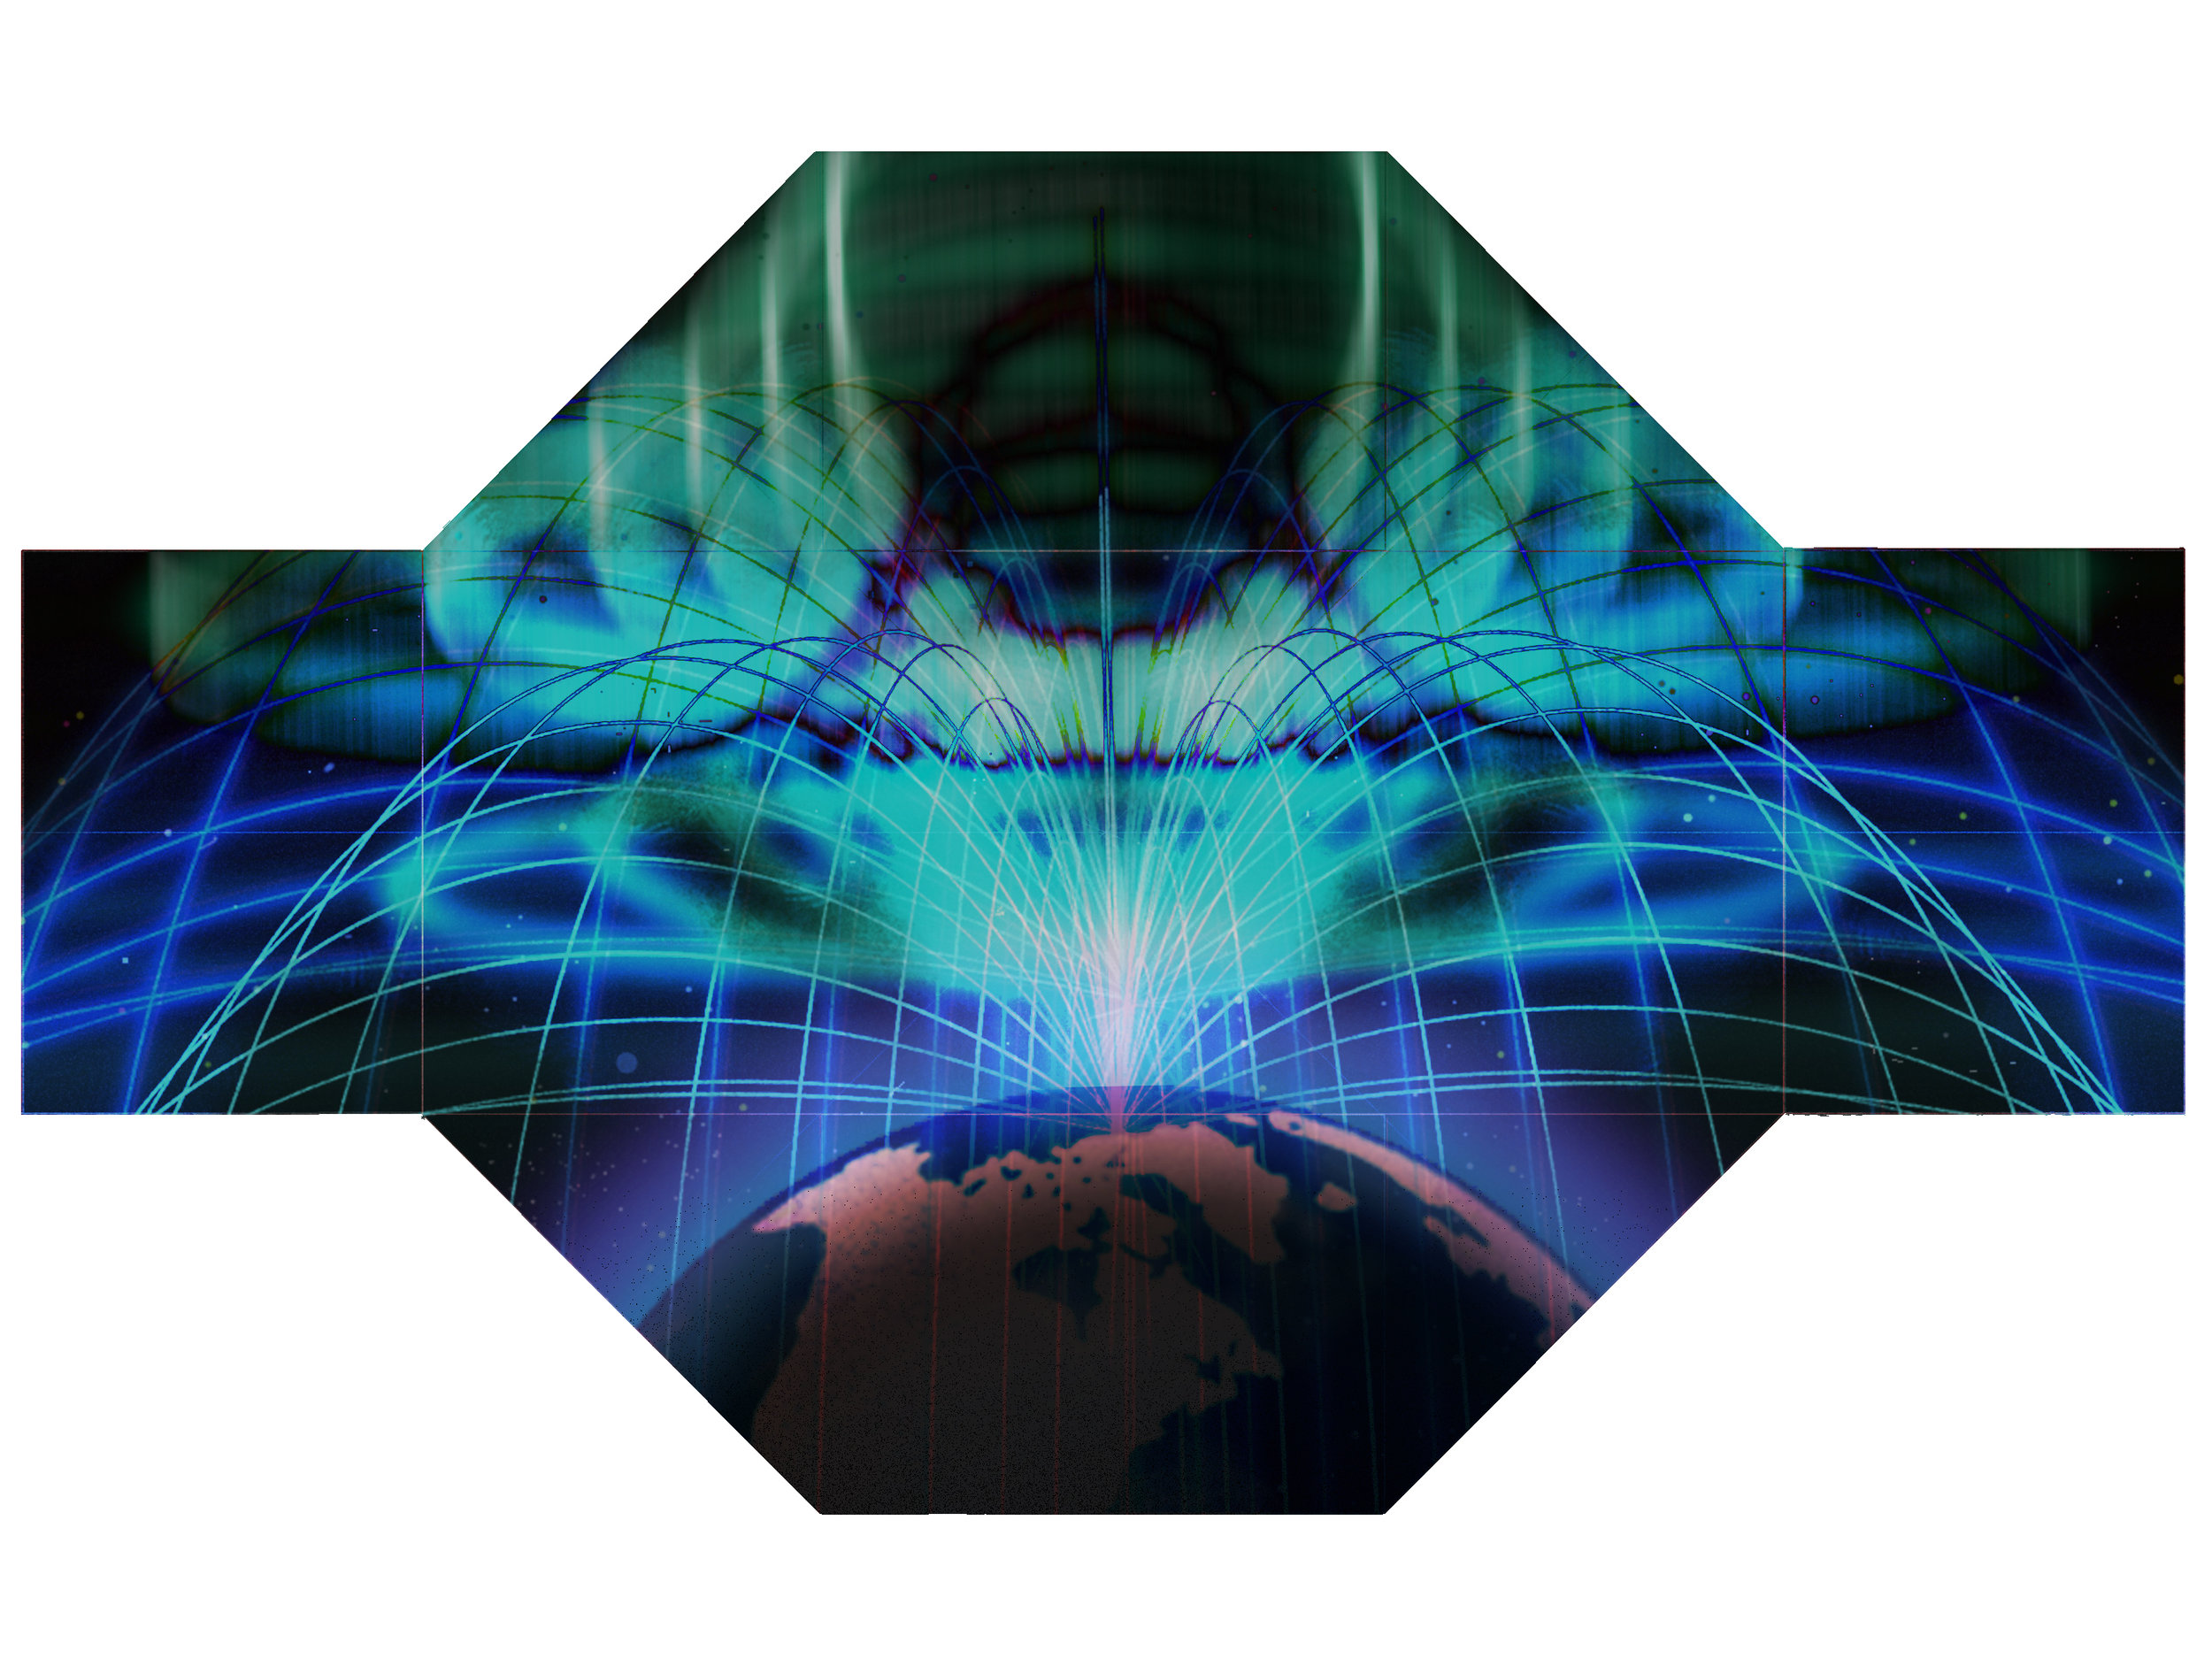 CaseStudySpheres_05.jpg